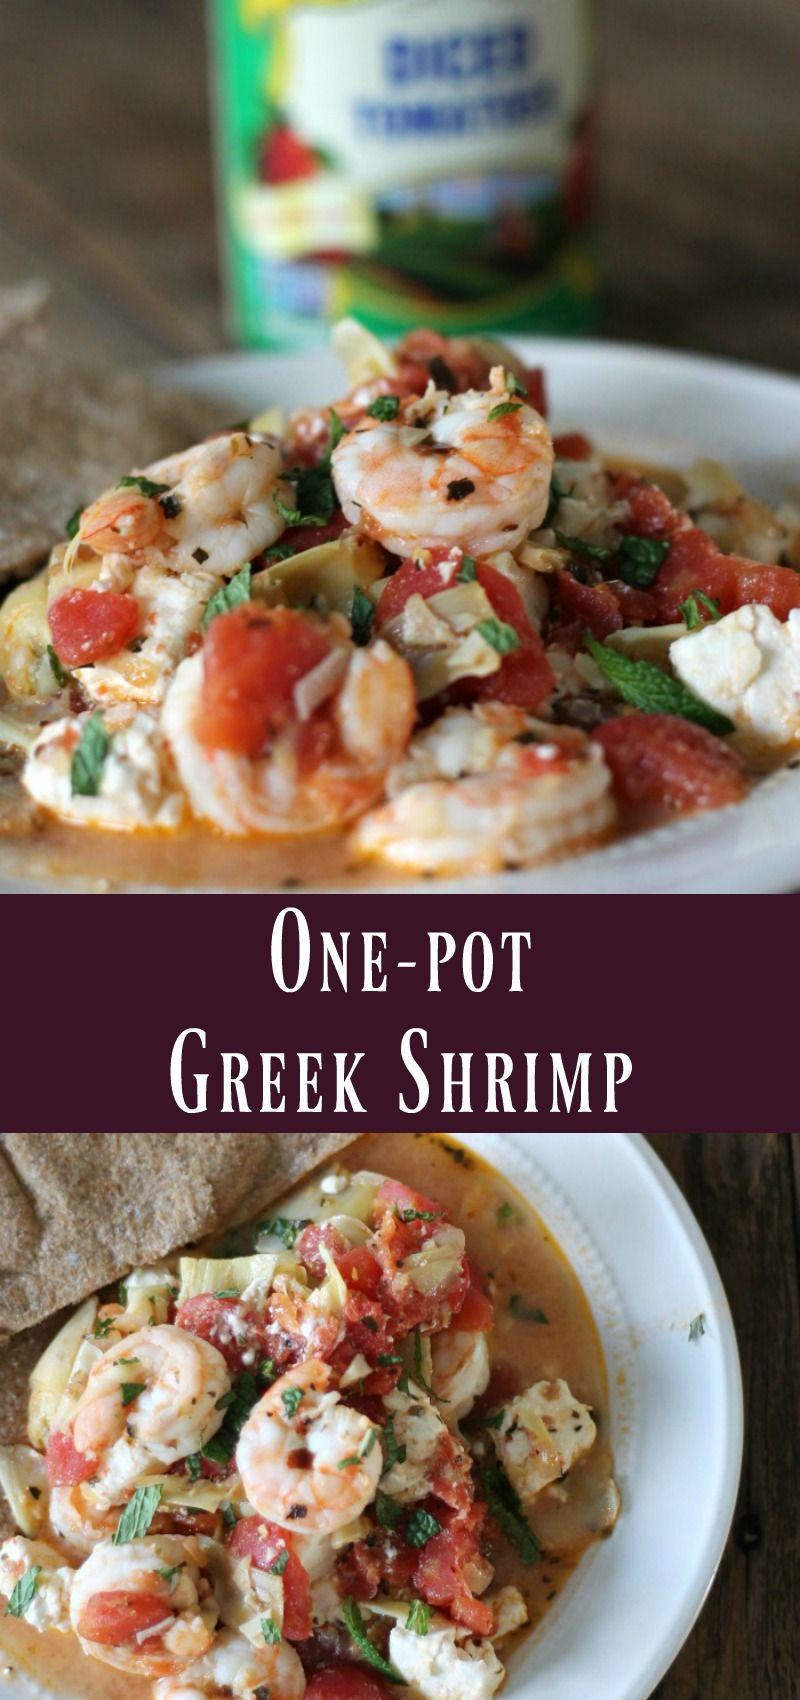 One pot greek shrimp recipe greek shrimp healthy dinner recipes food one pot greek shrimp healthy dinner recipe forumfinder Gallery